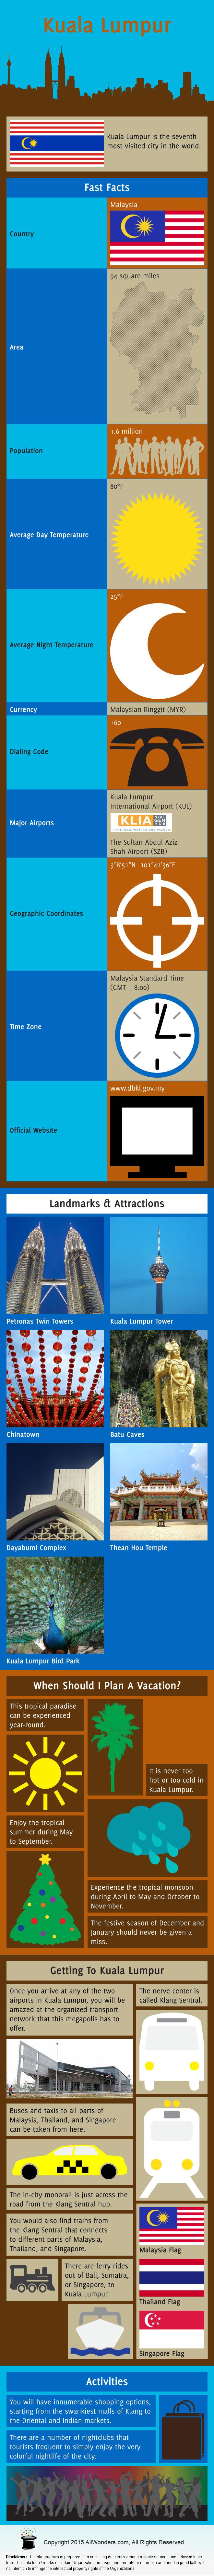 Kuala Lumpur Infographic